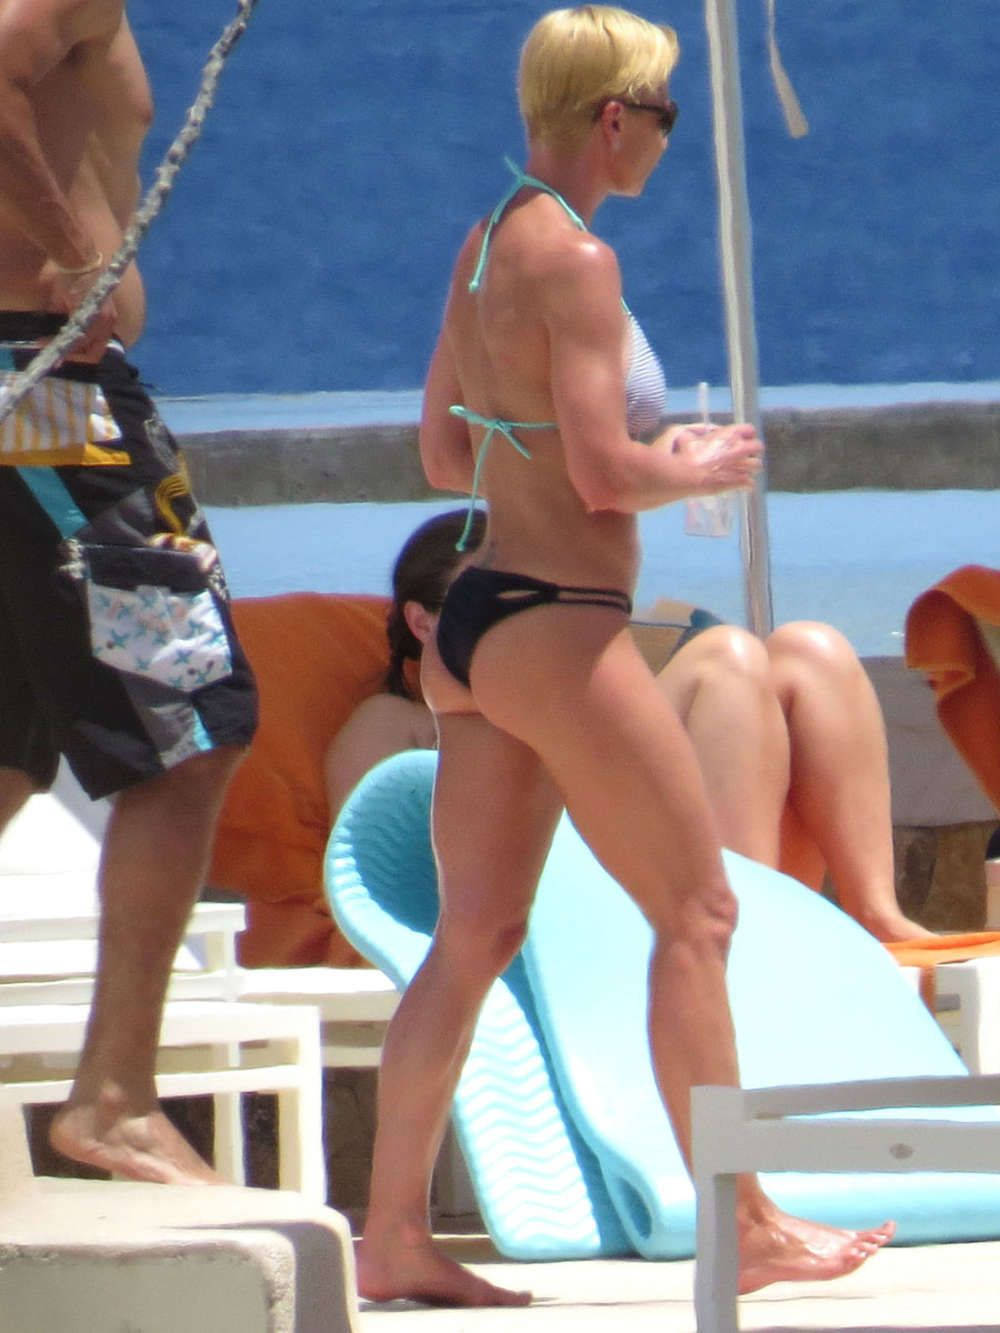 Bikini Jaime pressley